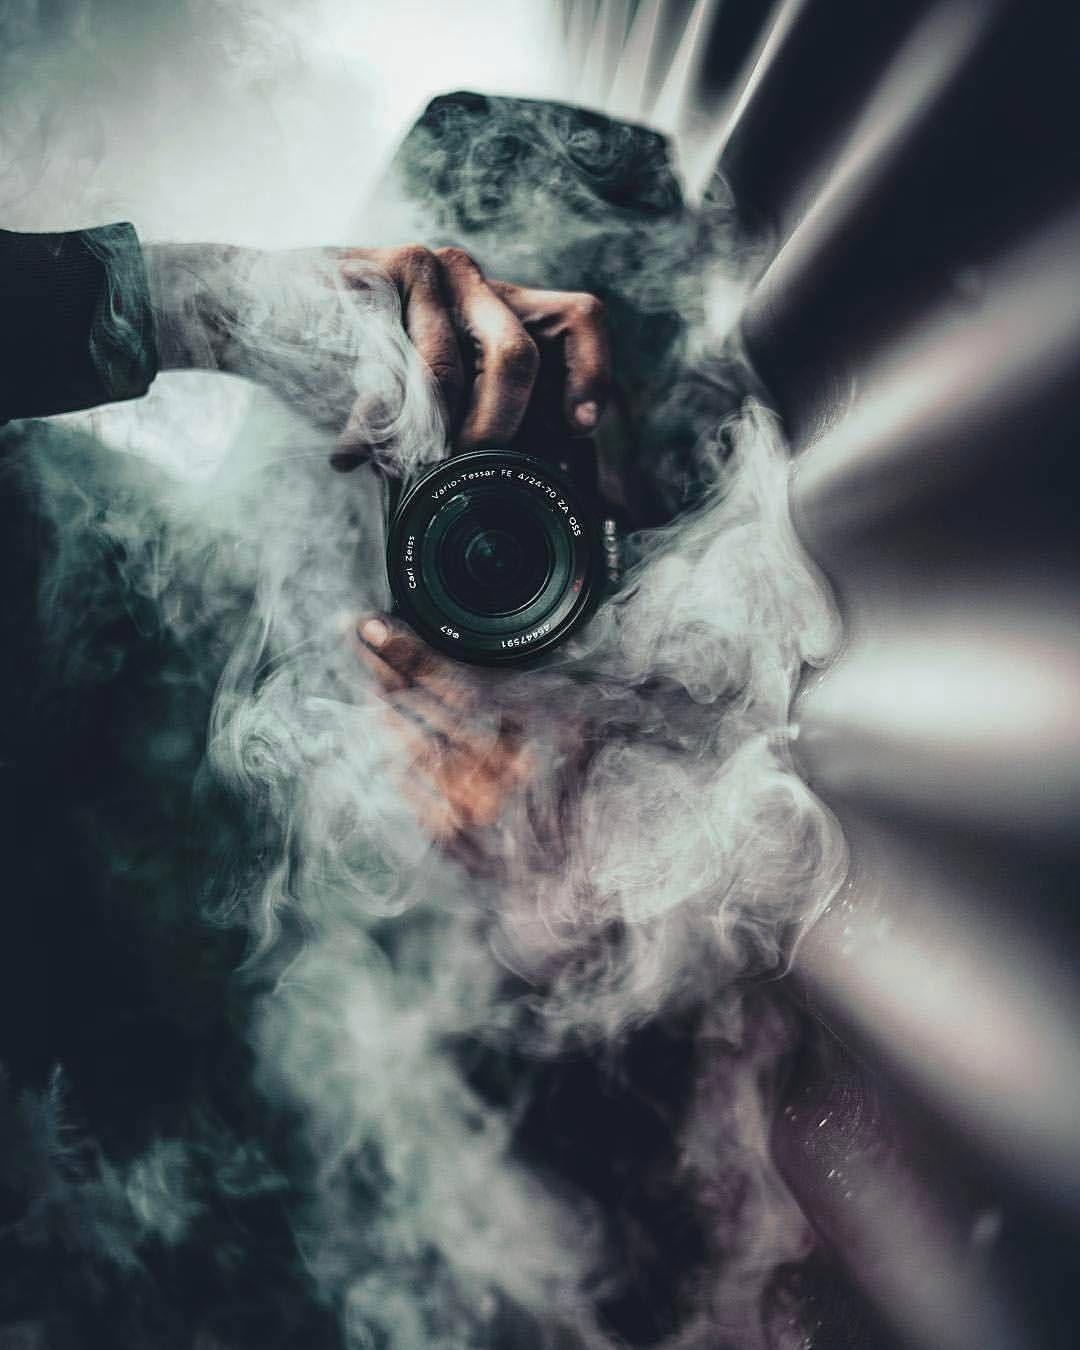 Visual Photography: Polubienia: 5,696, Komentarze: 110